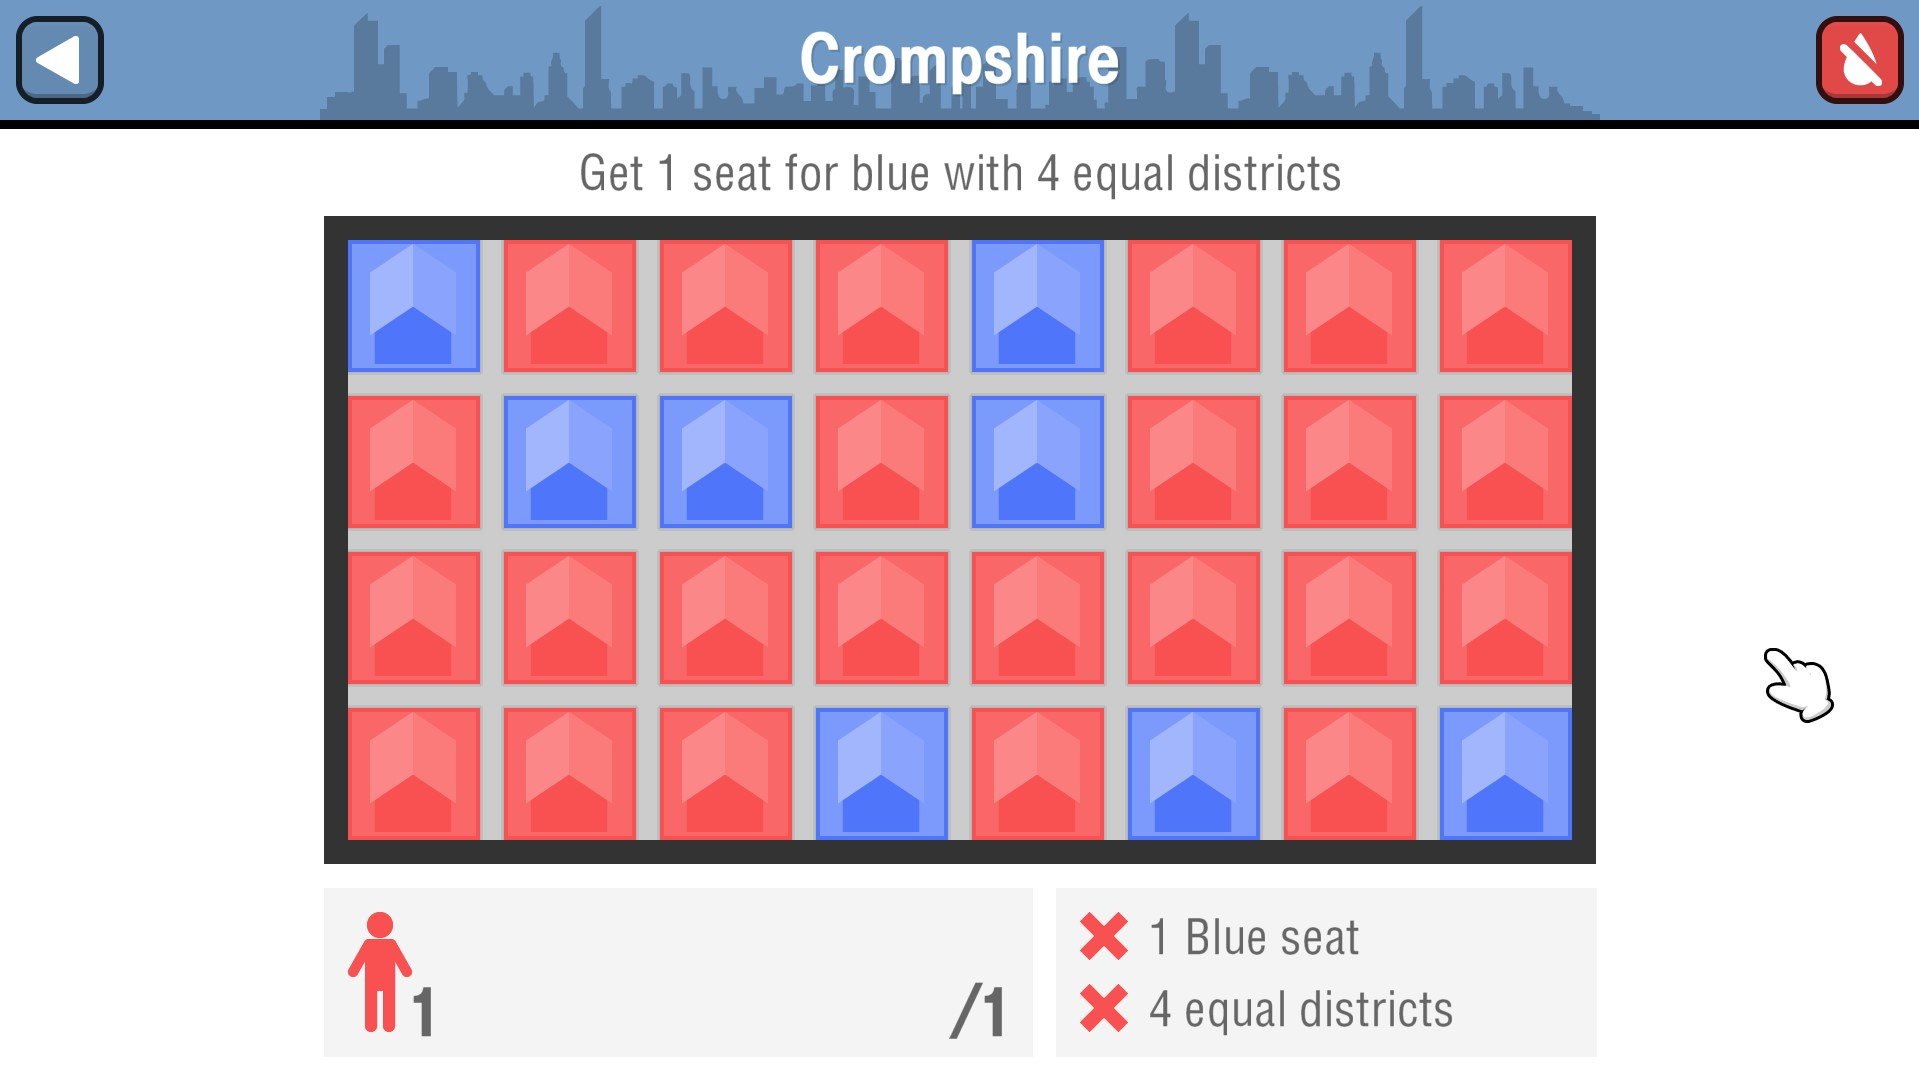 Crompshire